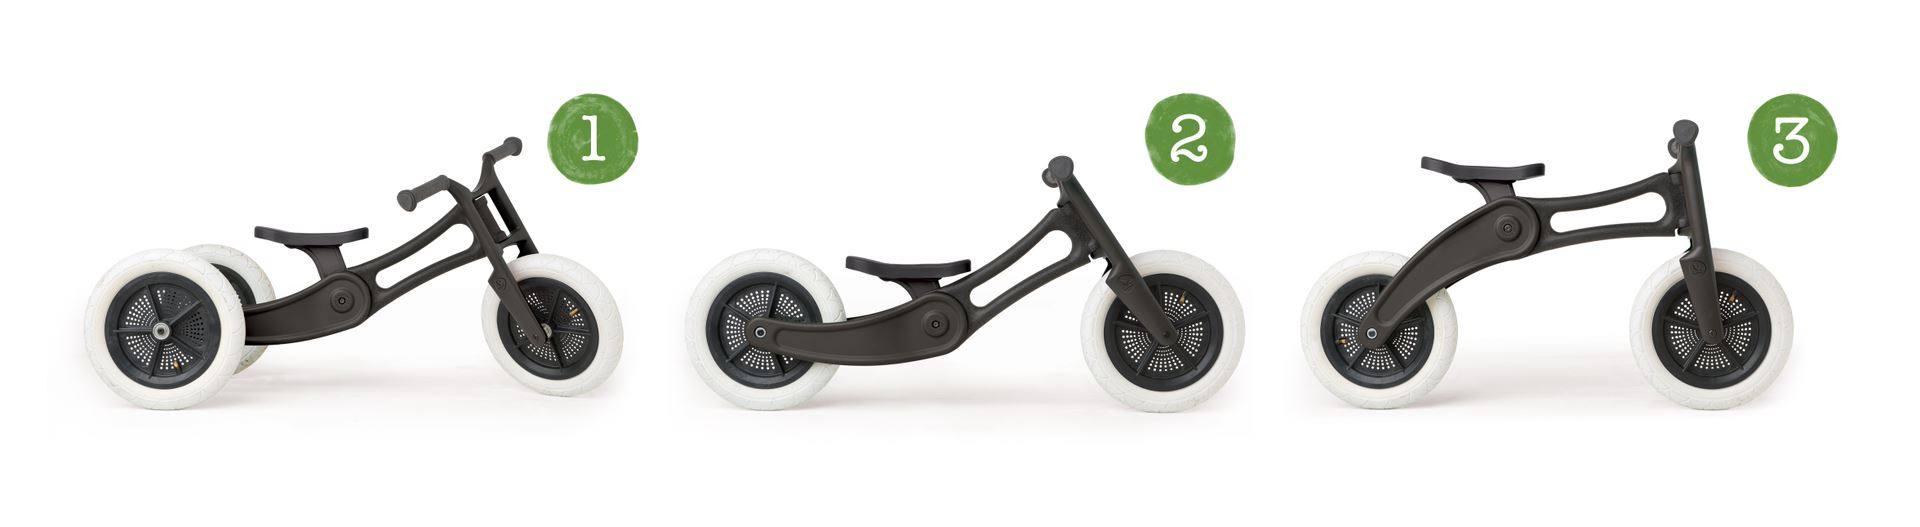 Wishbone Laufrad 3-in-1 RE 9